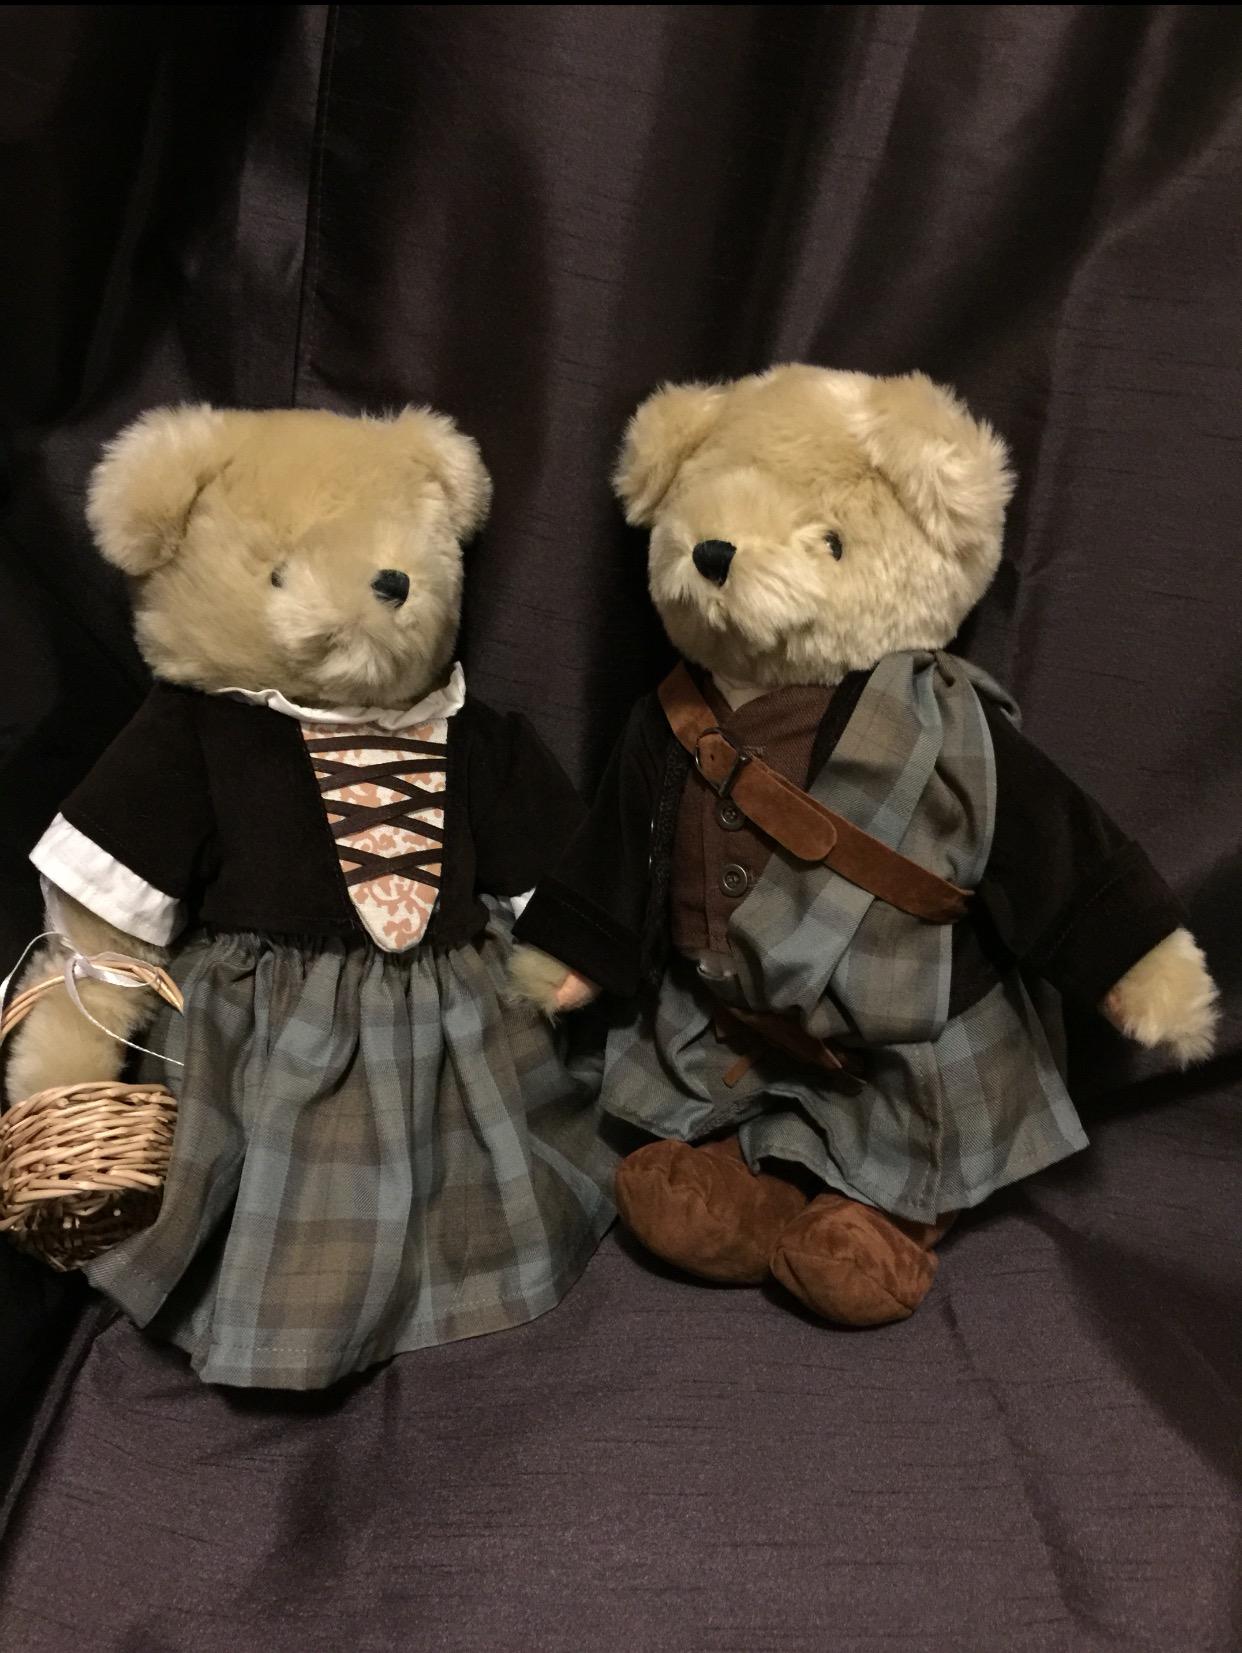 Outlander bears by North American Bear Co.